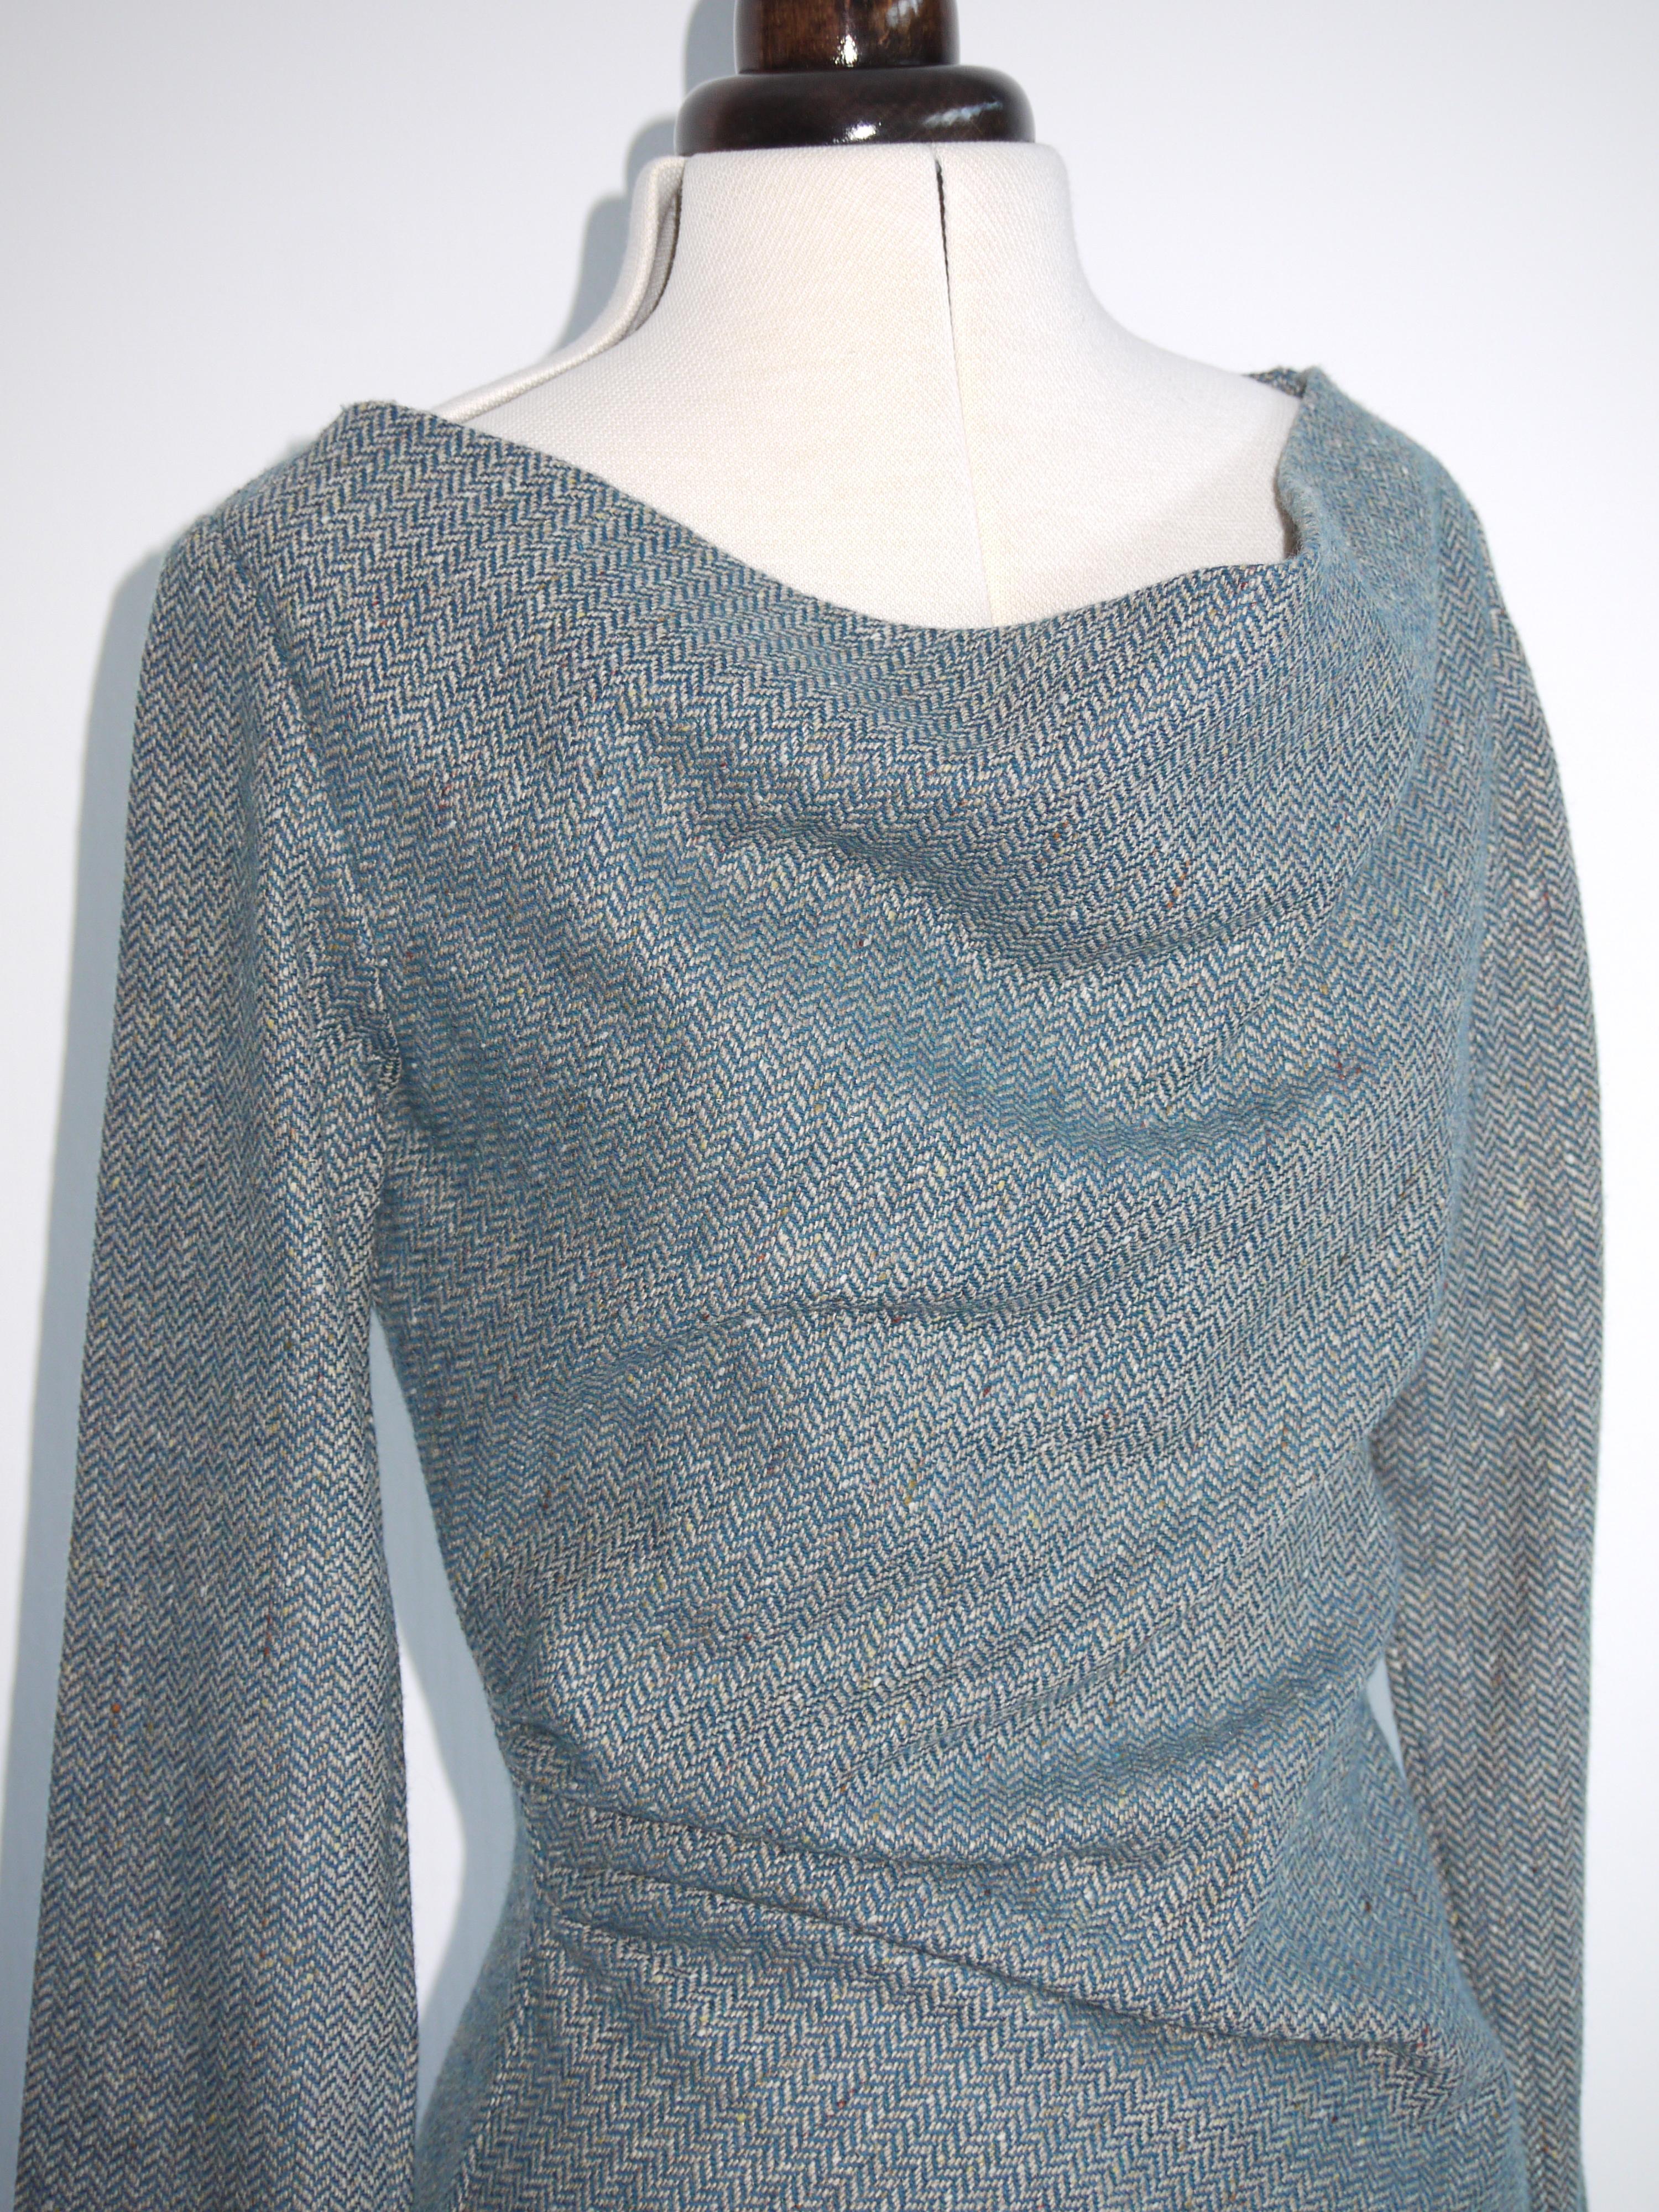 British tweed wool fabric